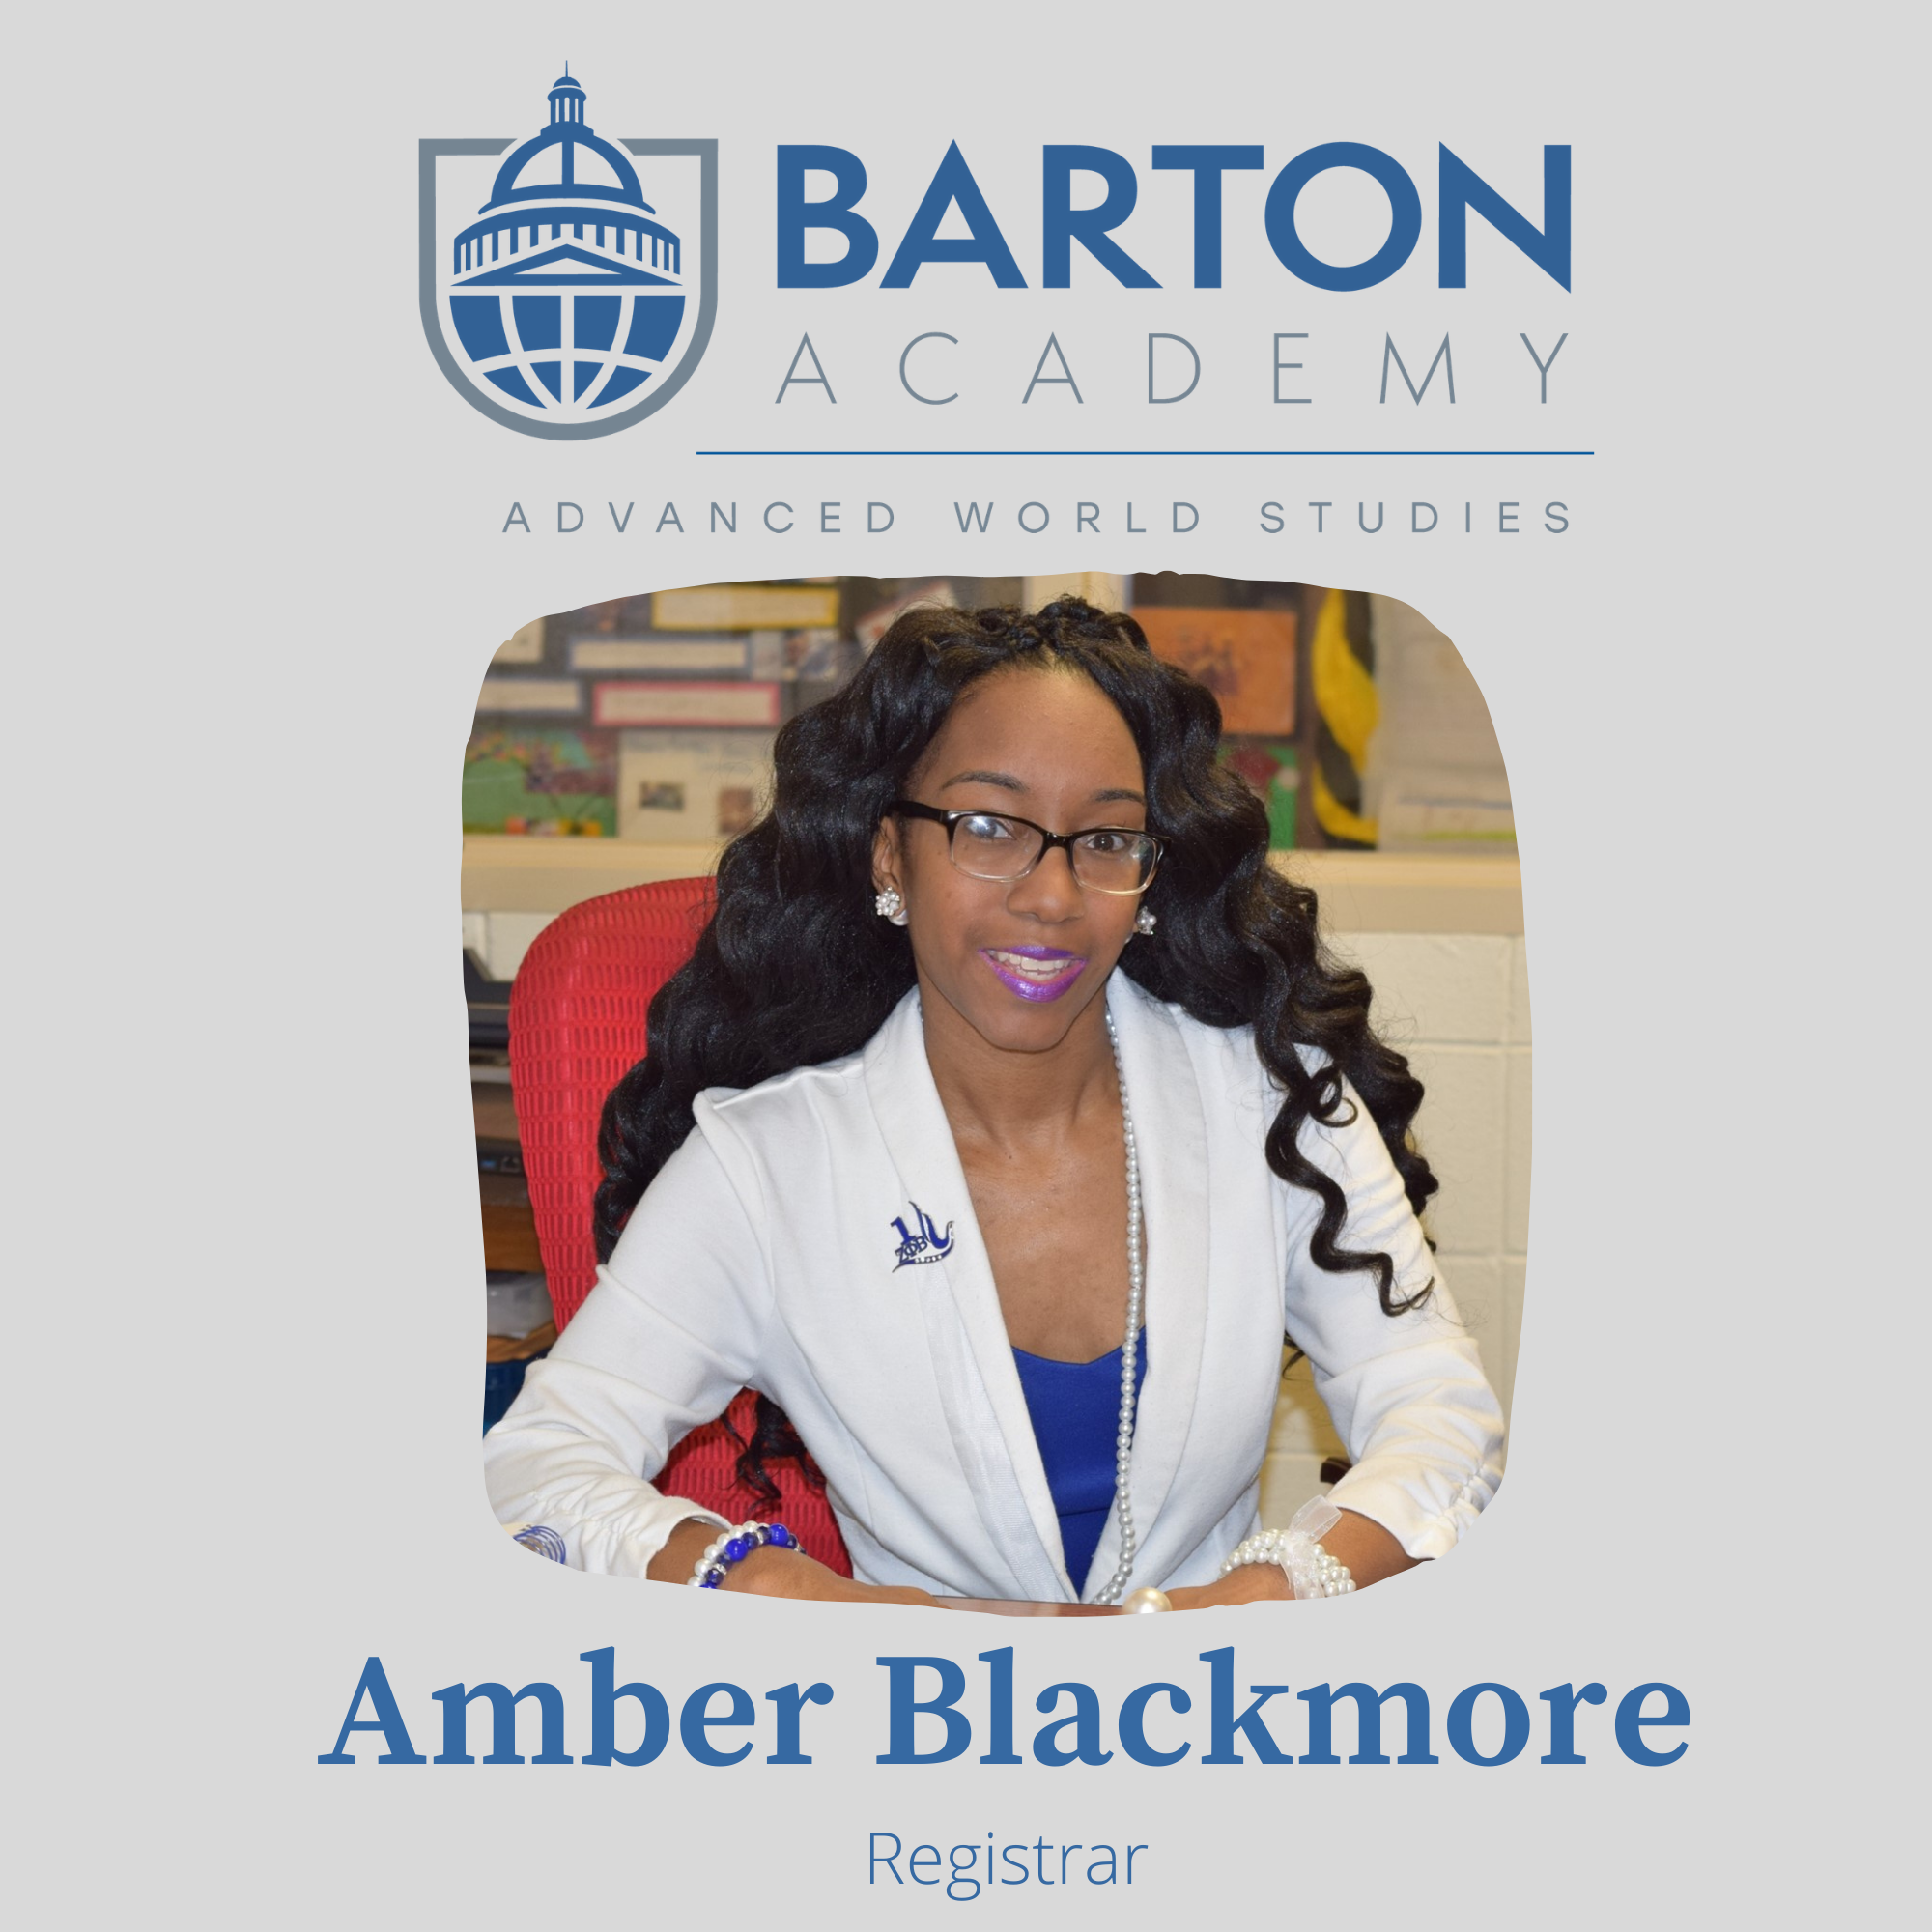 Amber Blackmore